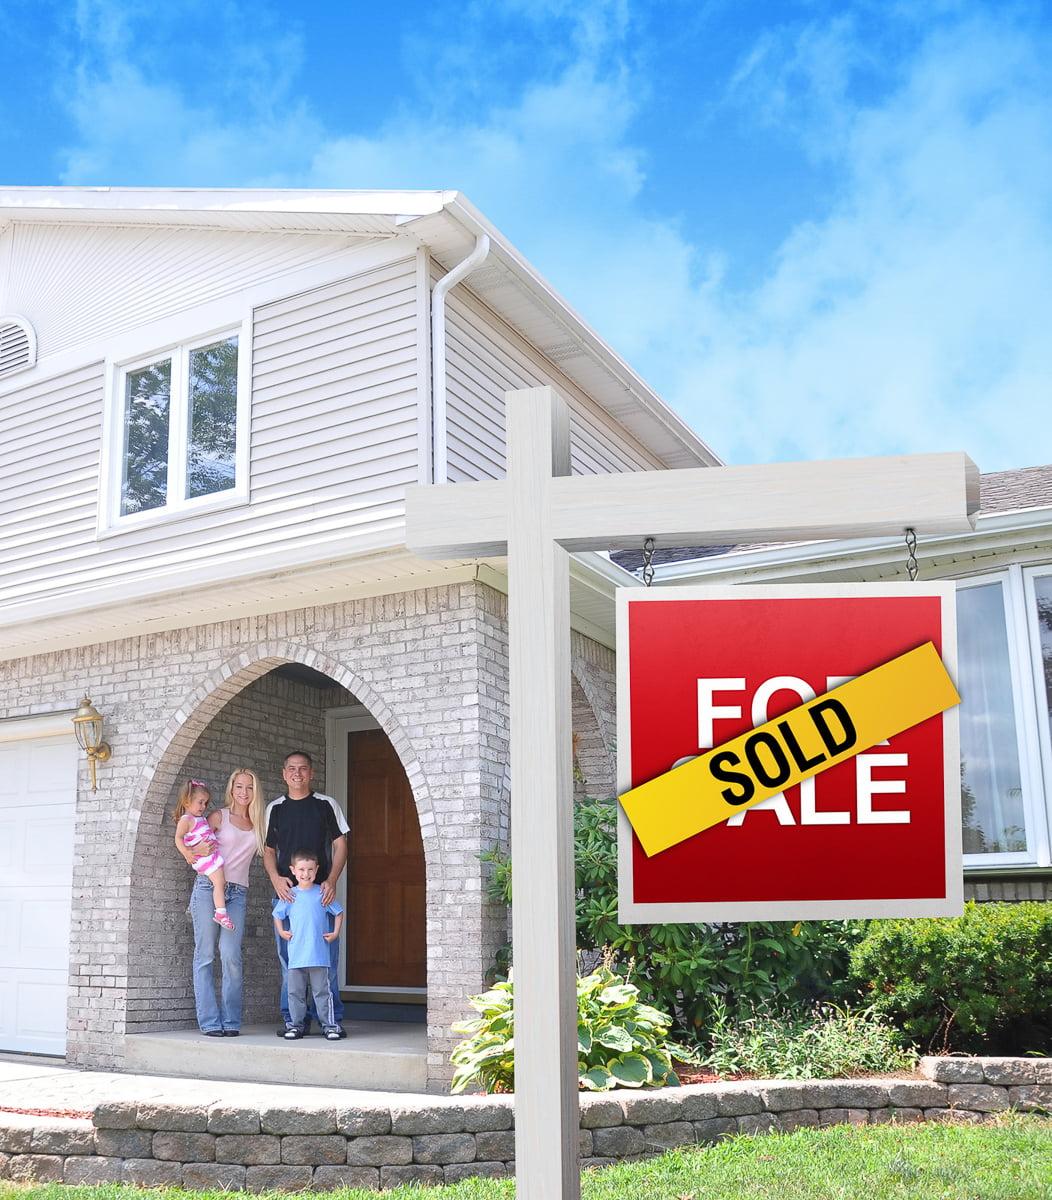 Sold real estate listing